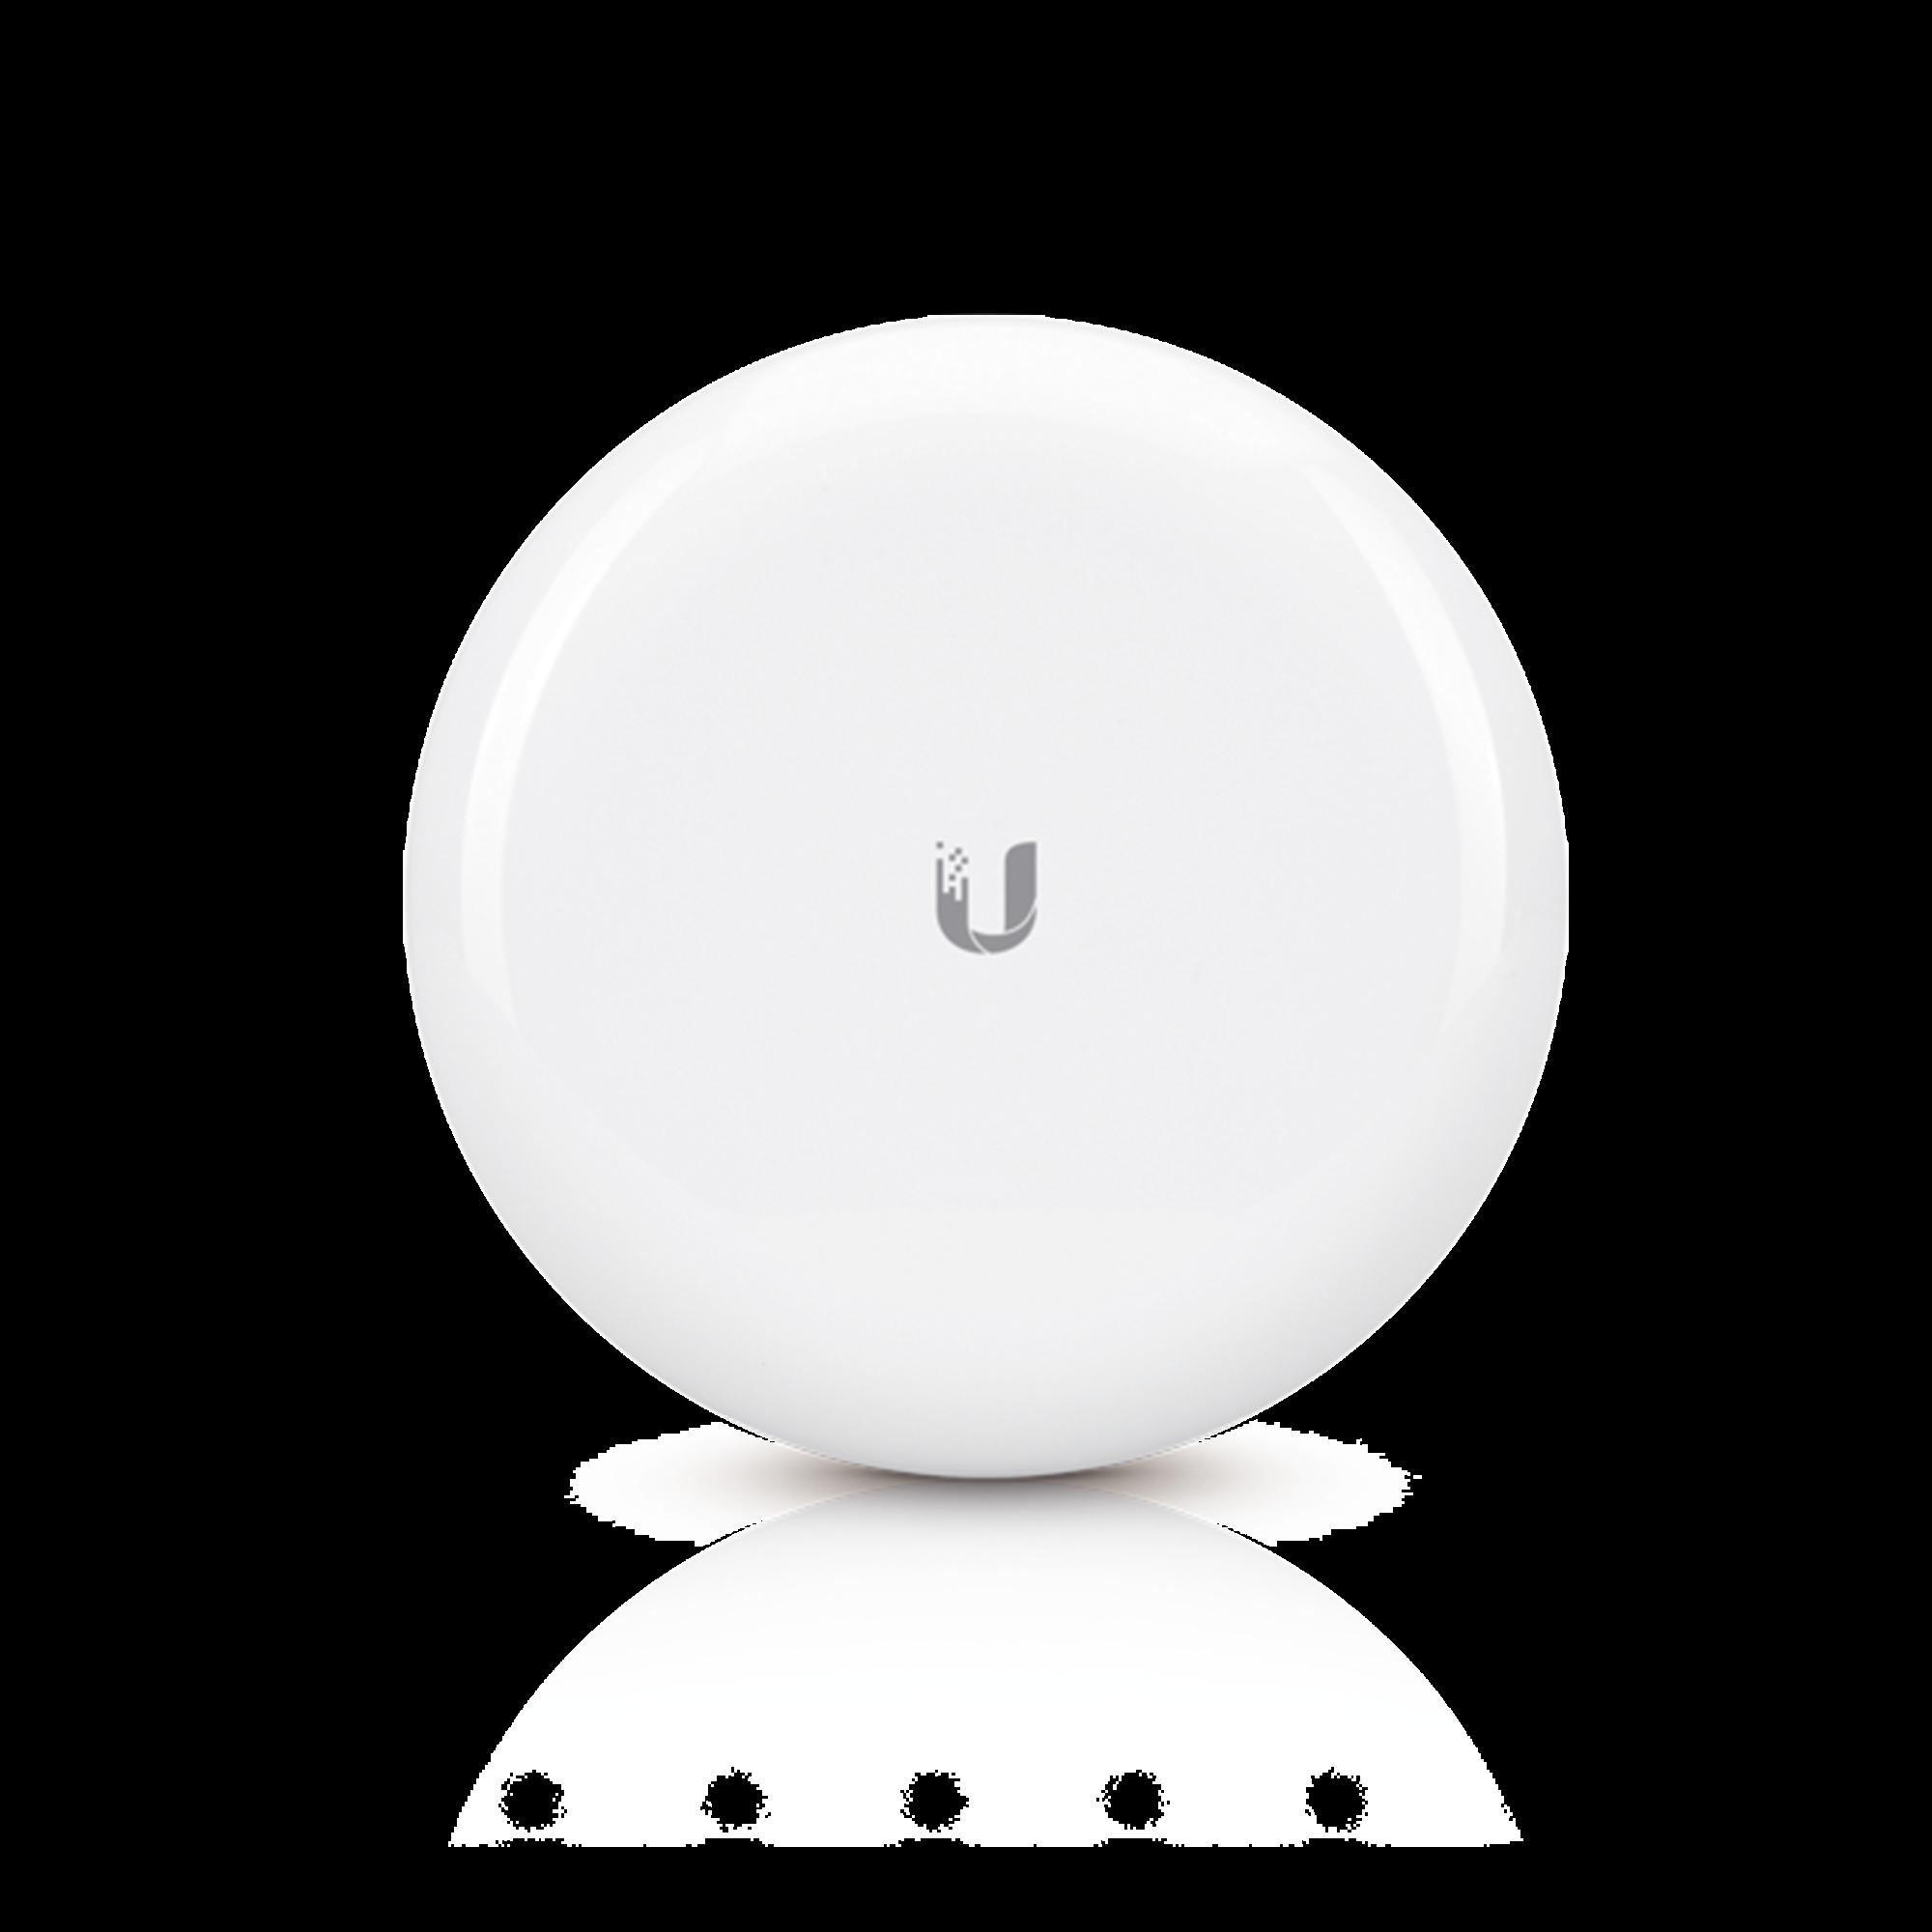 Radio airMAX de alta capacidad, hasta 1 Gbps en 60 GHz con failover en 5 GHz, con antena integrada de 17.2 y 10 dBi respectivamente